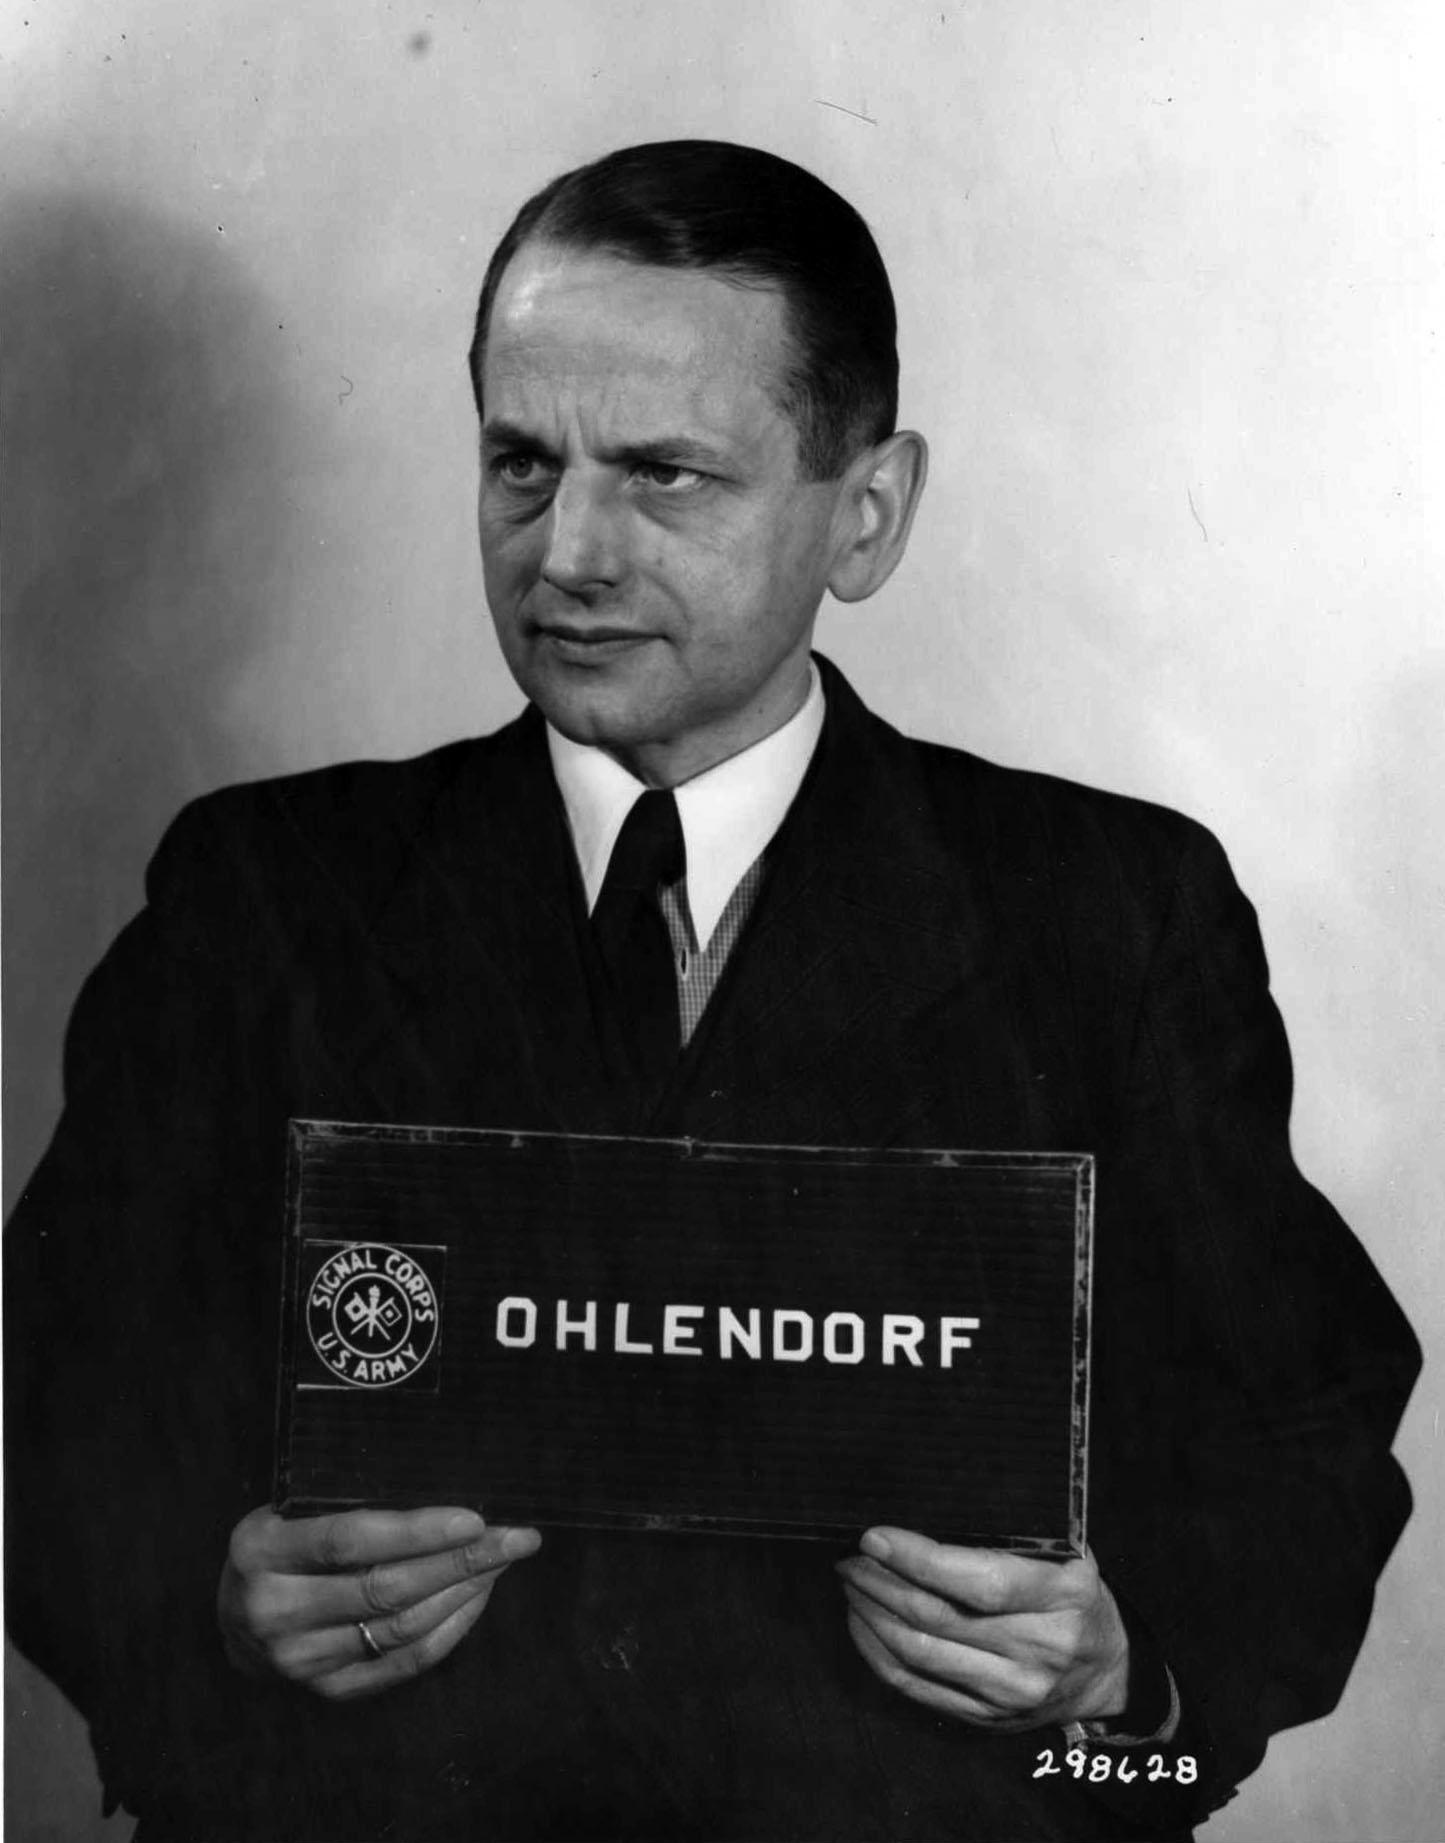 Otto Ohlendorf Net Worth